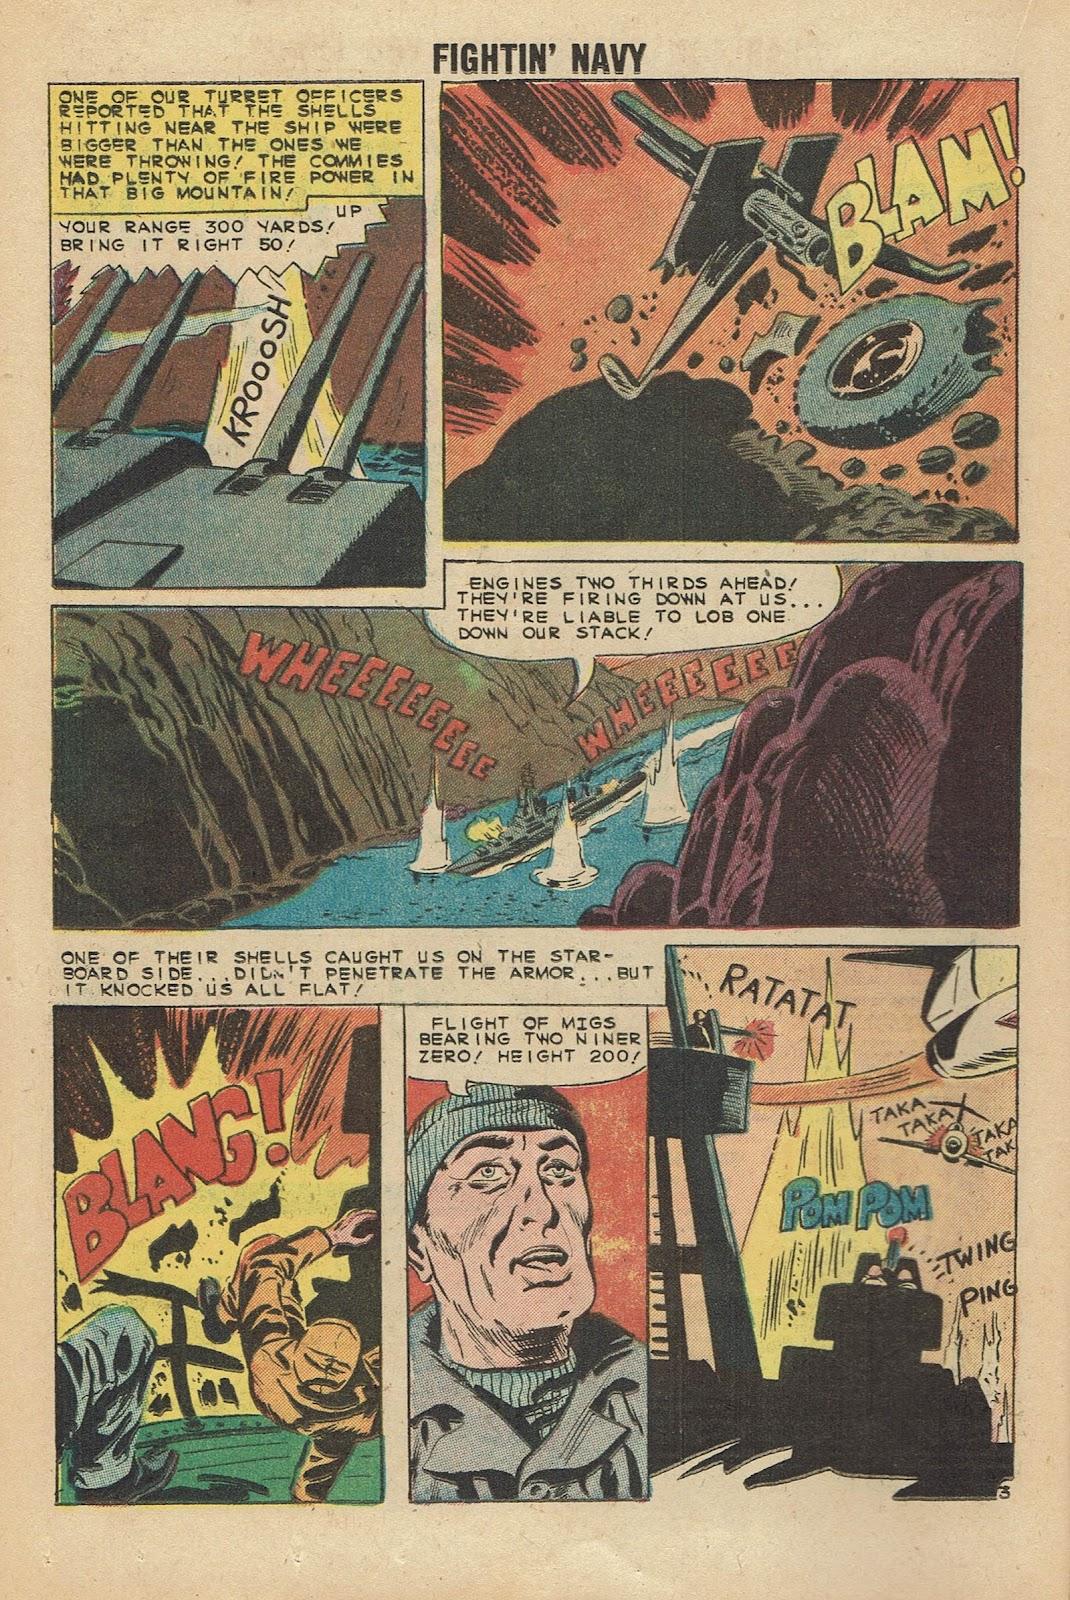 Read online Fightin' Navy comic -  Issue #96 - 16